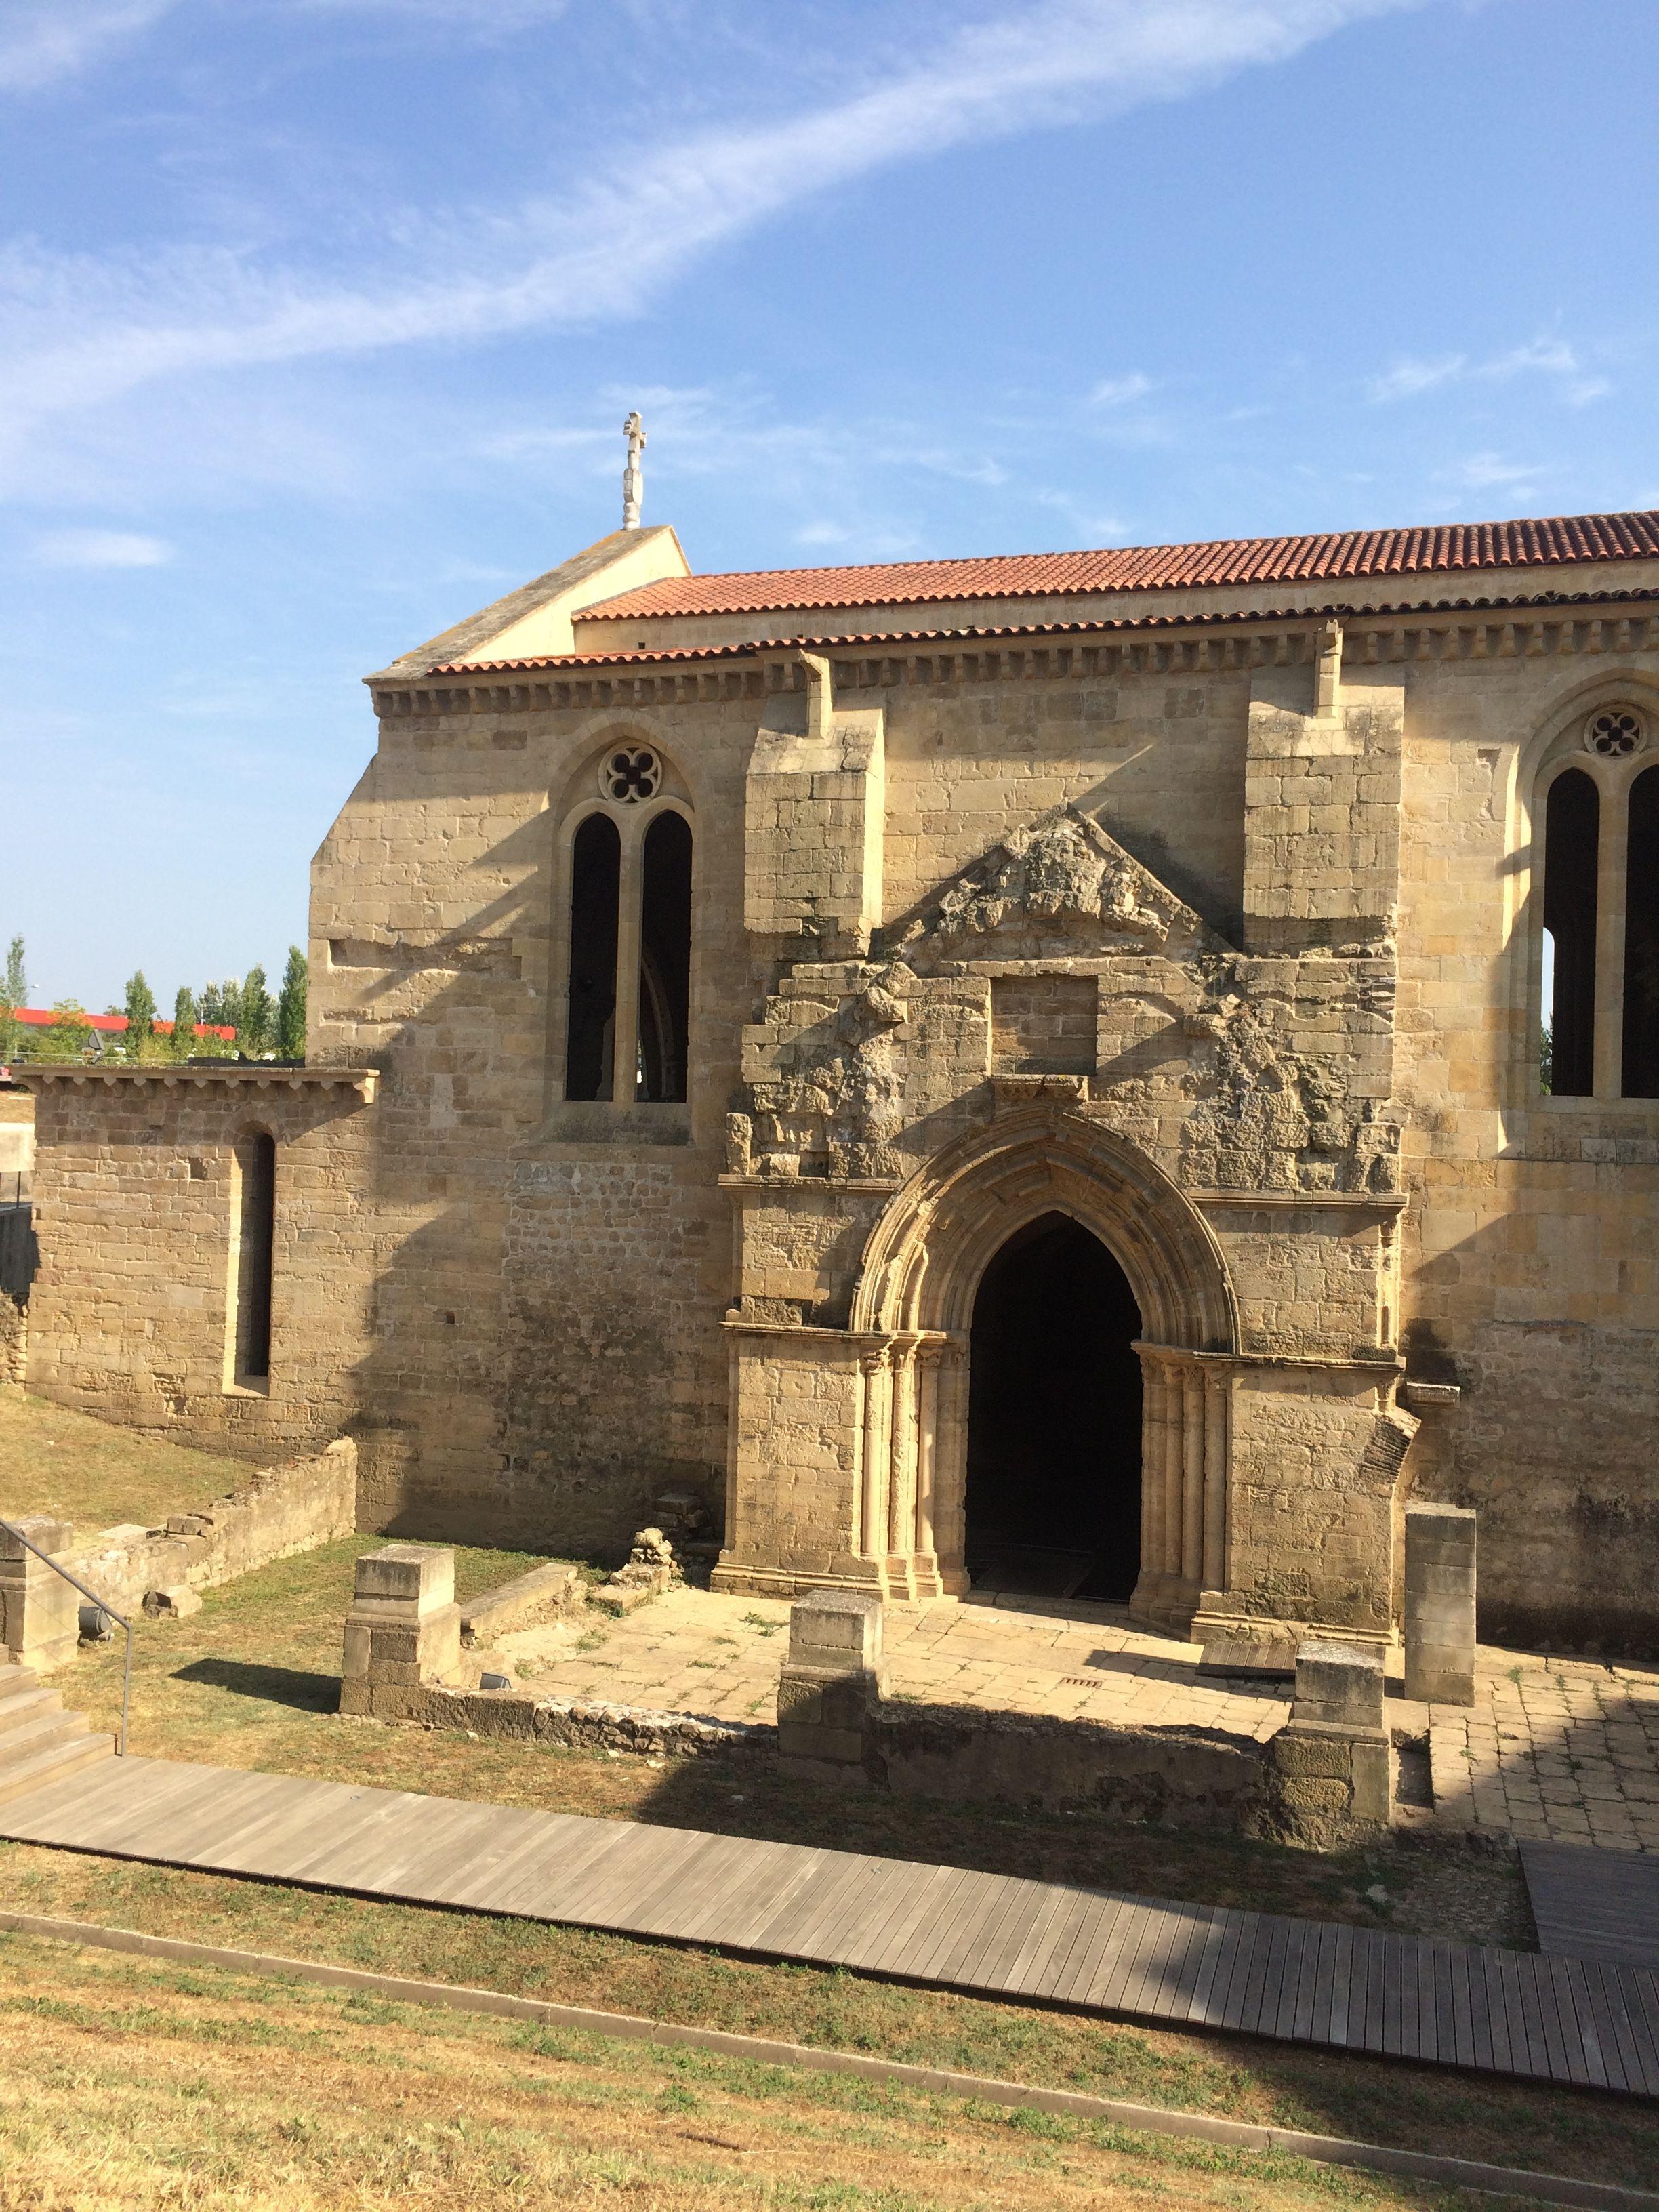 Mosteiro De Santa Clara A Velha Coimbra Portugal Barcelona Cathedral Coimbra Portugal